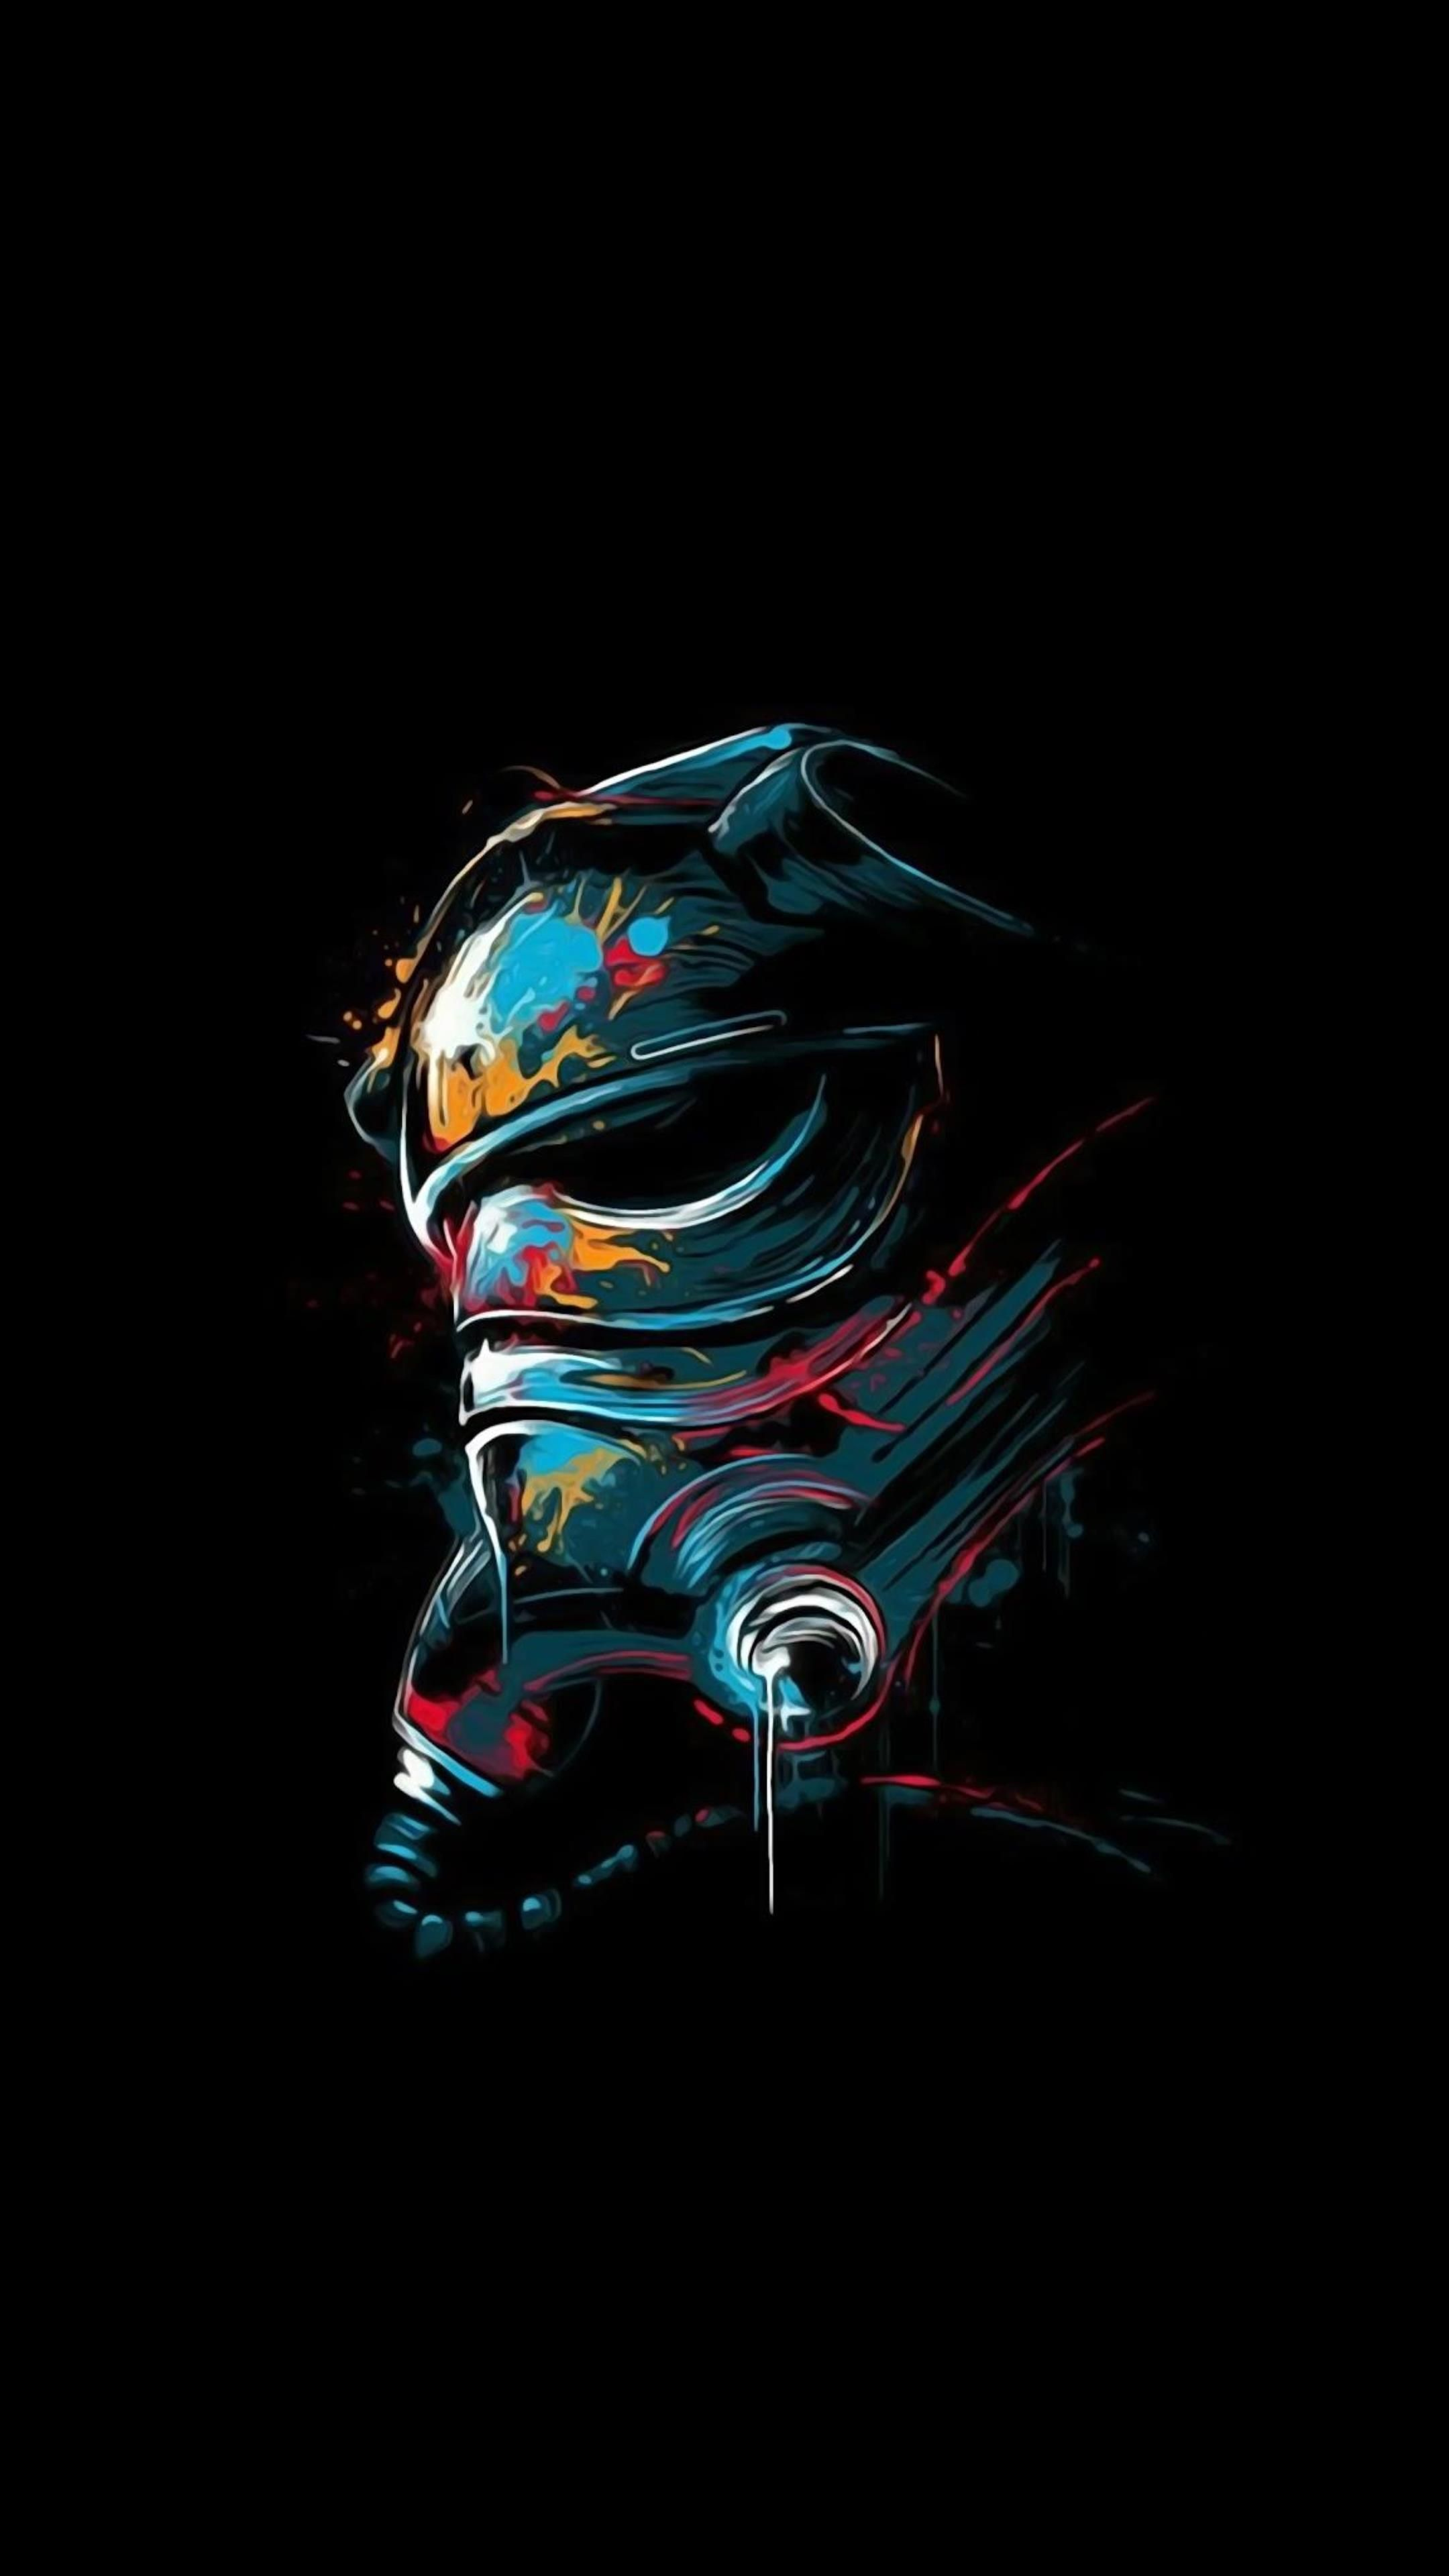 Artwork, star wars, villain, Kylo Ren, 720x1280 wallpaper